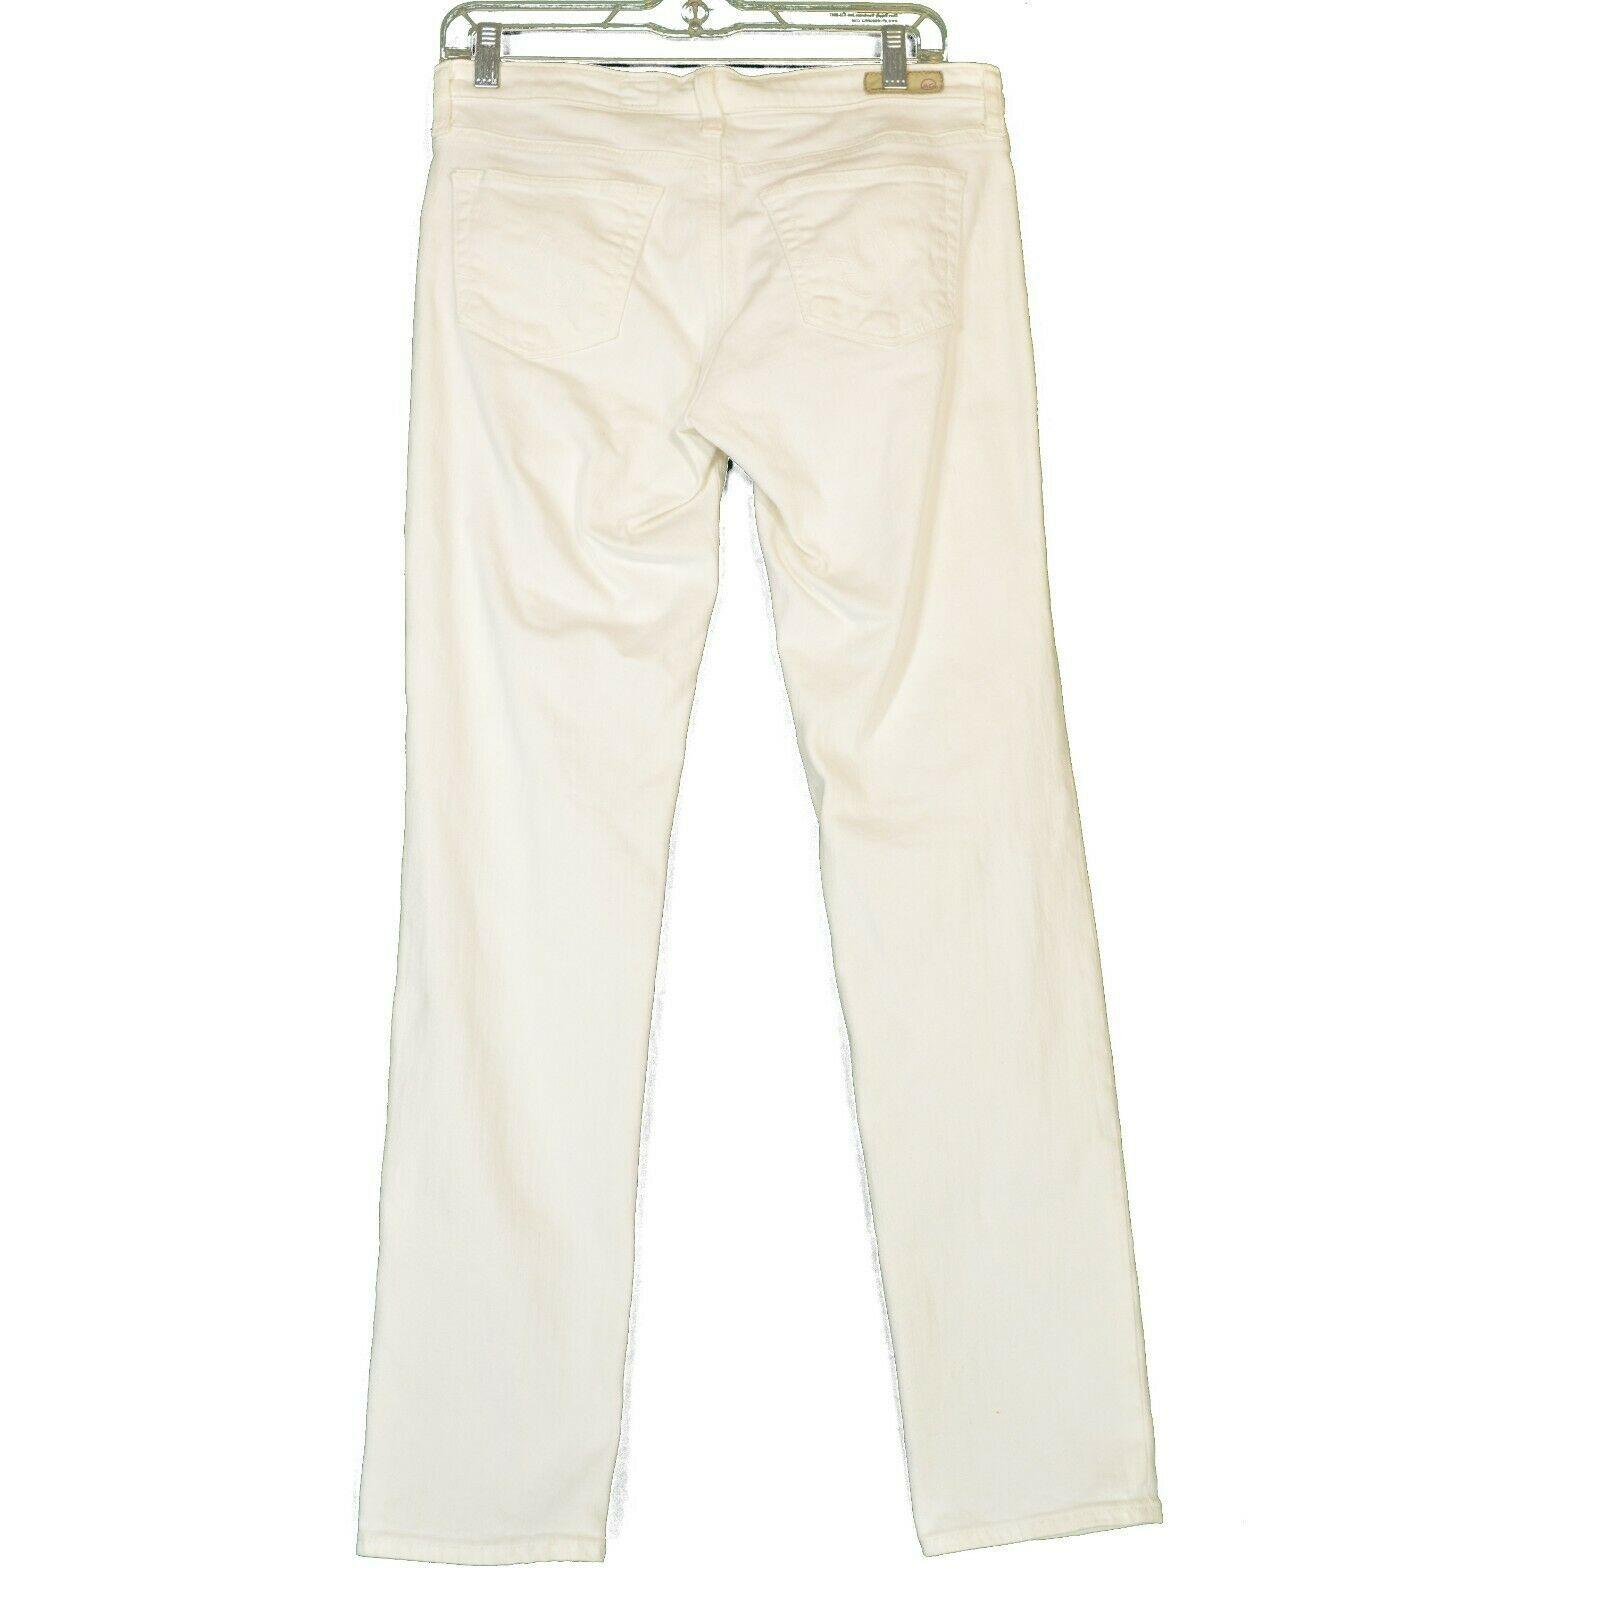 AG Adriano Goldschmied jeans 29 x 31 Stilt cigarette leg White thick EUCUSA image 2